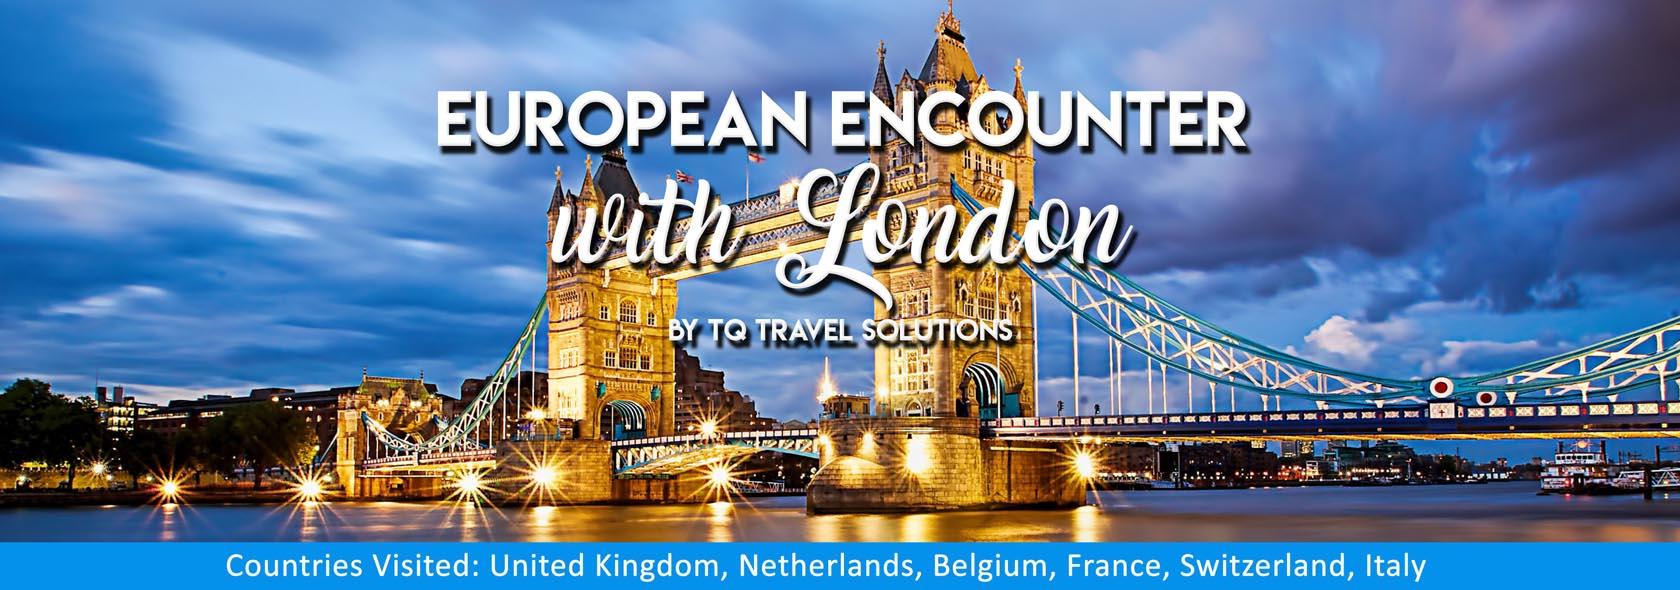 TQ Travel Solutions - European Encounter with London Tour